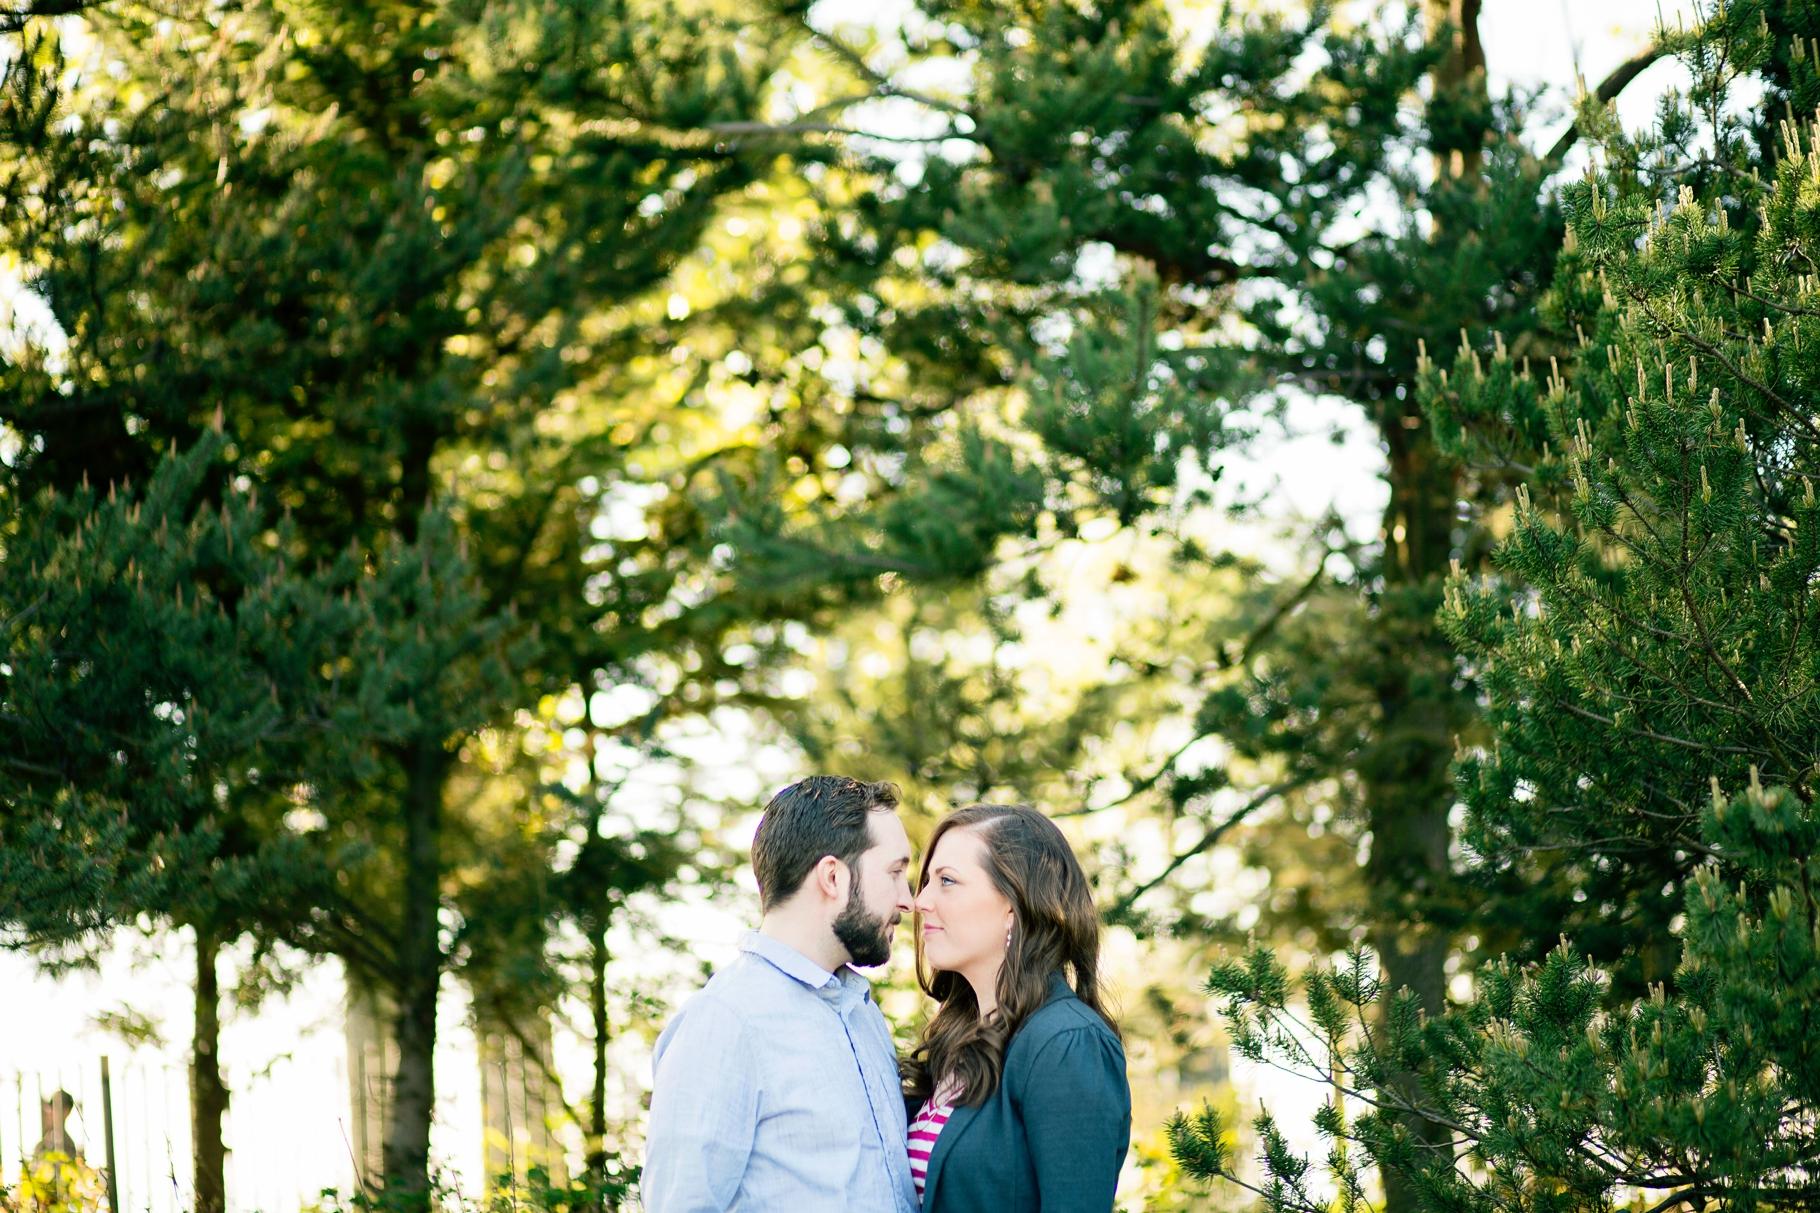 4-Engaged-Seattle-Waterfront-Myrtle-Edwards-Park-Woodland-Beach-Romantic-Enagement-Photographer-Wedding-Photography-by-Betty-Elaine